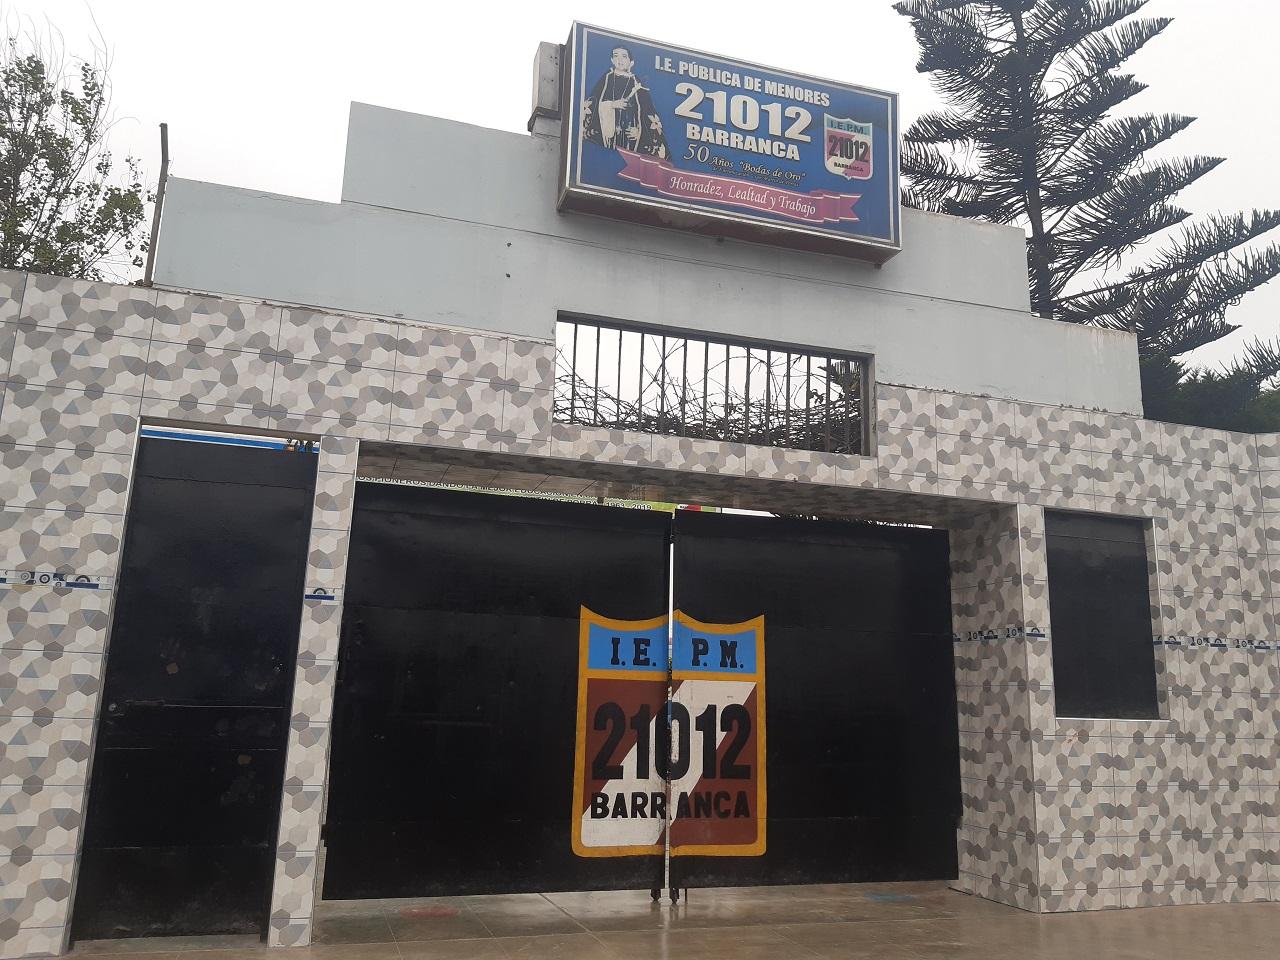 Escuela 21012 - Barranca